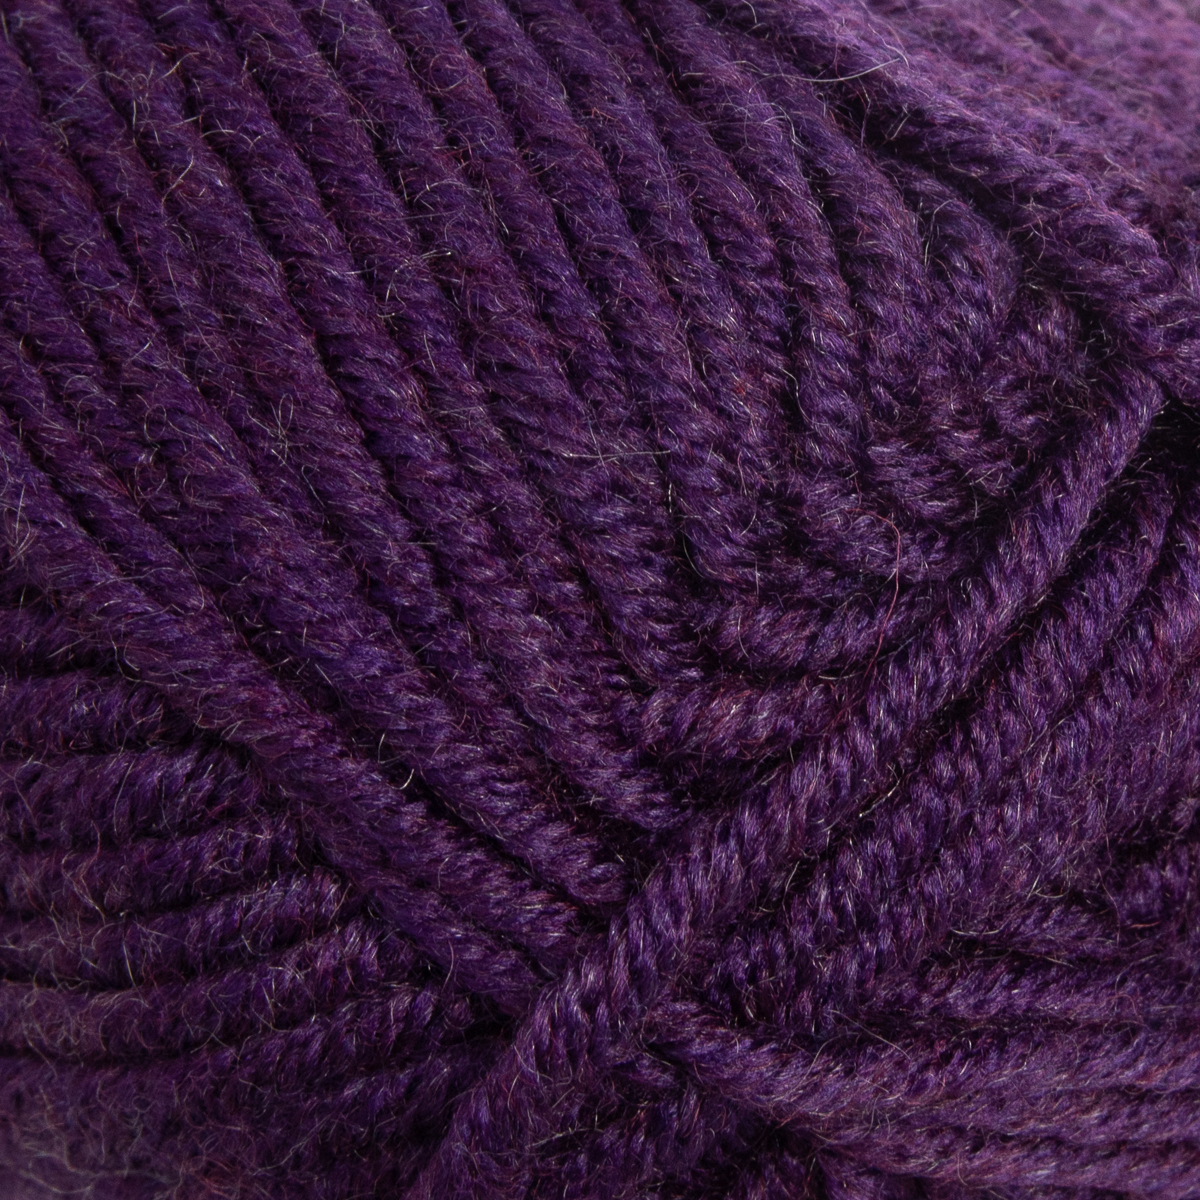 3pk-Lion-Brand-Woolspun-Acrylic-amp-Wool-Yarn-Bulky-5-Knit-Crocheting-Skeins-Soft thumbnail 79